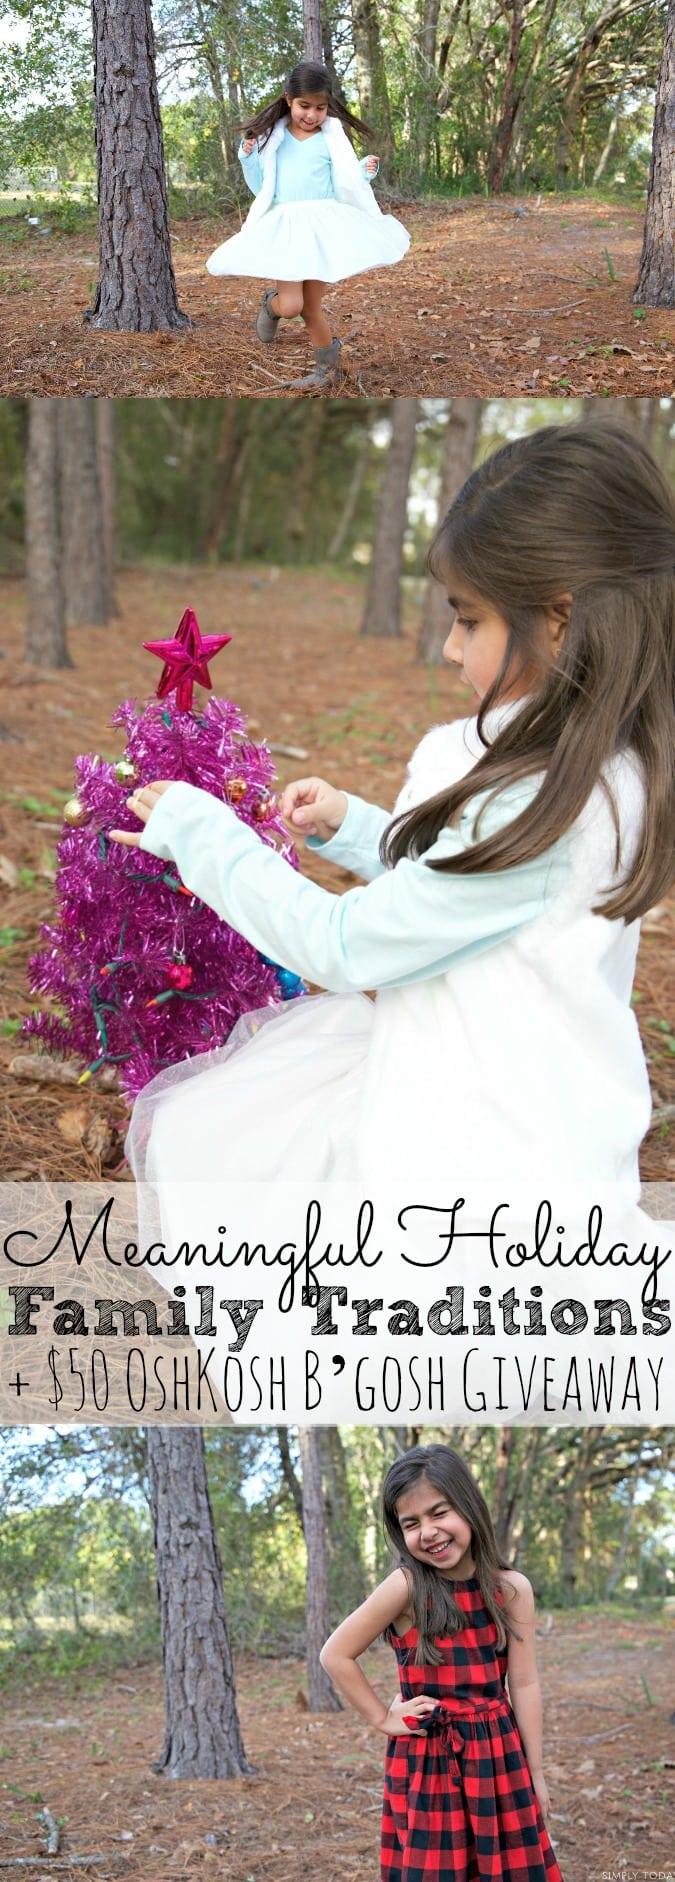 Meaningful Family Holiday Traditions + $50 OshKosh B'gosh Giveaway - simplytodaylife.com